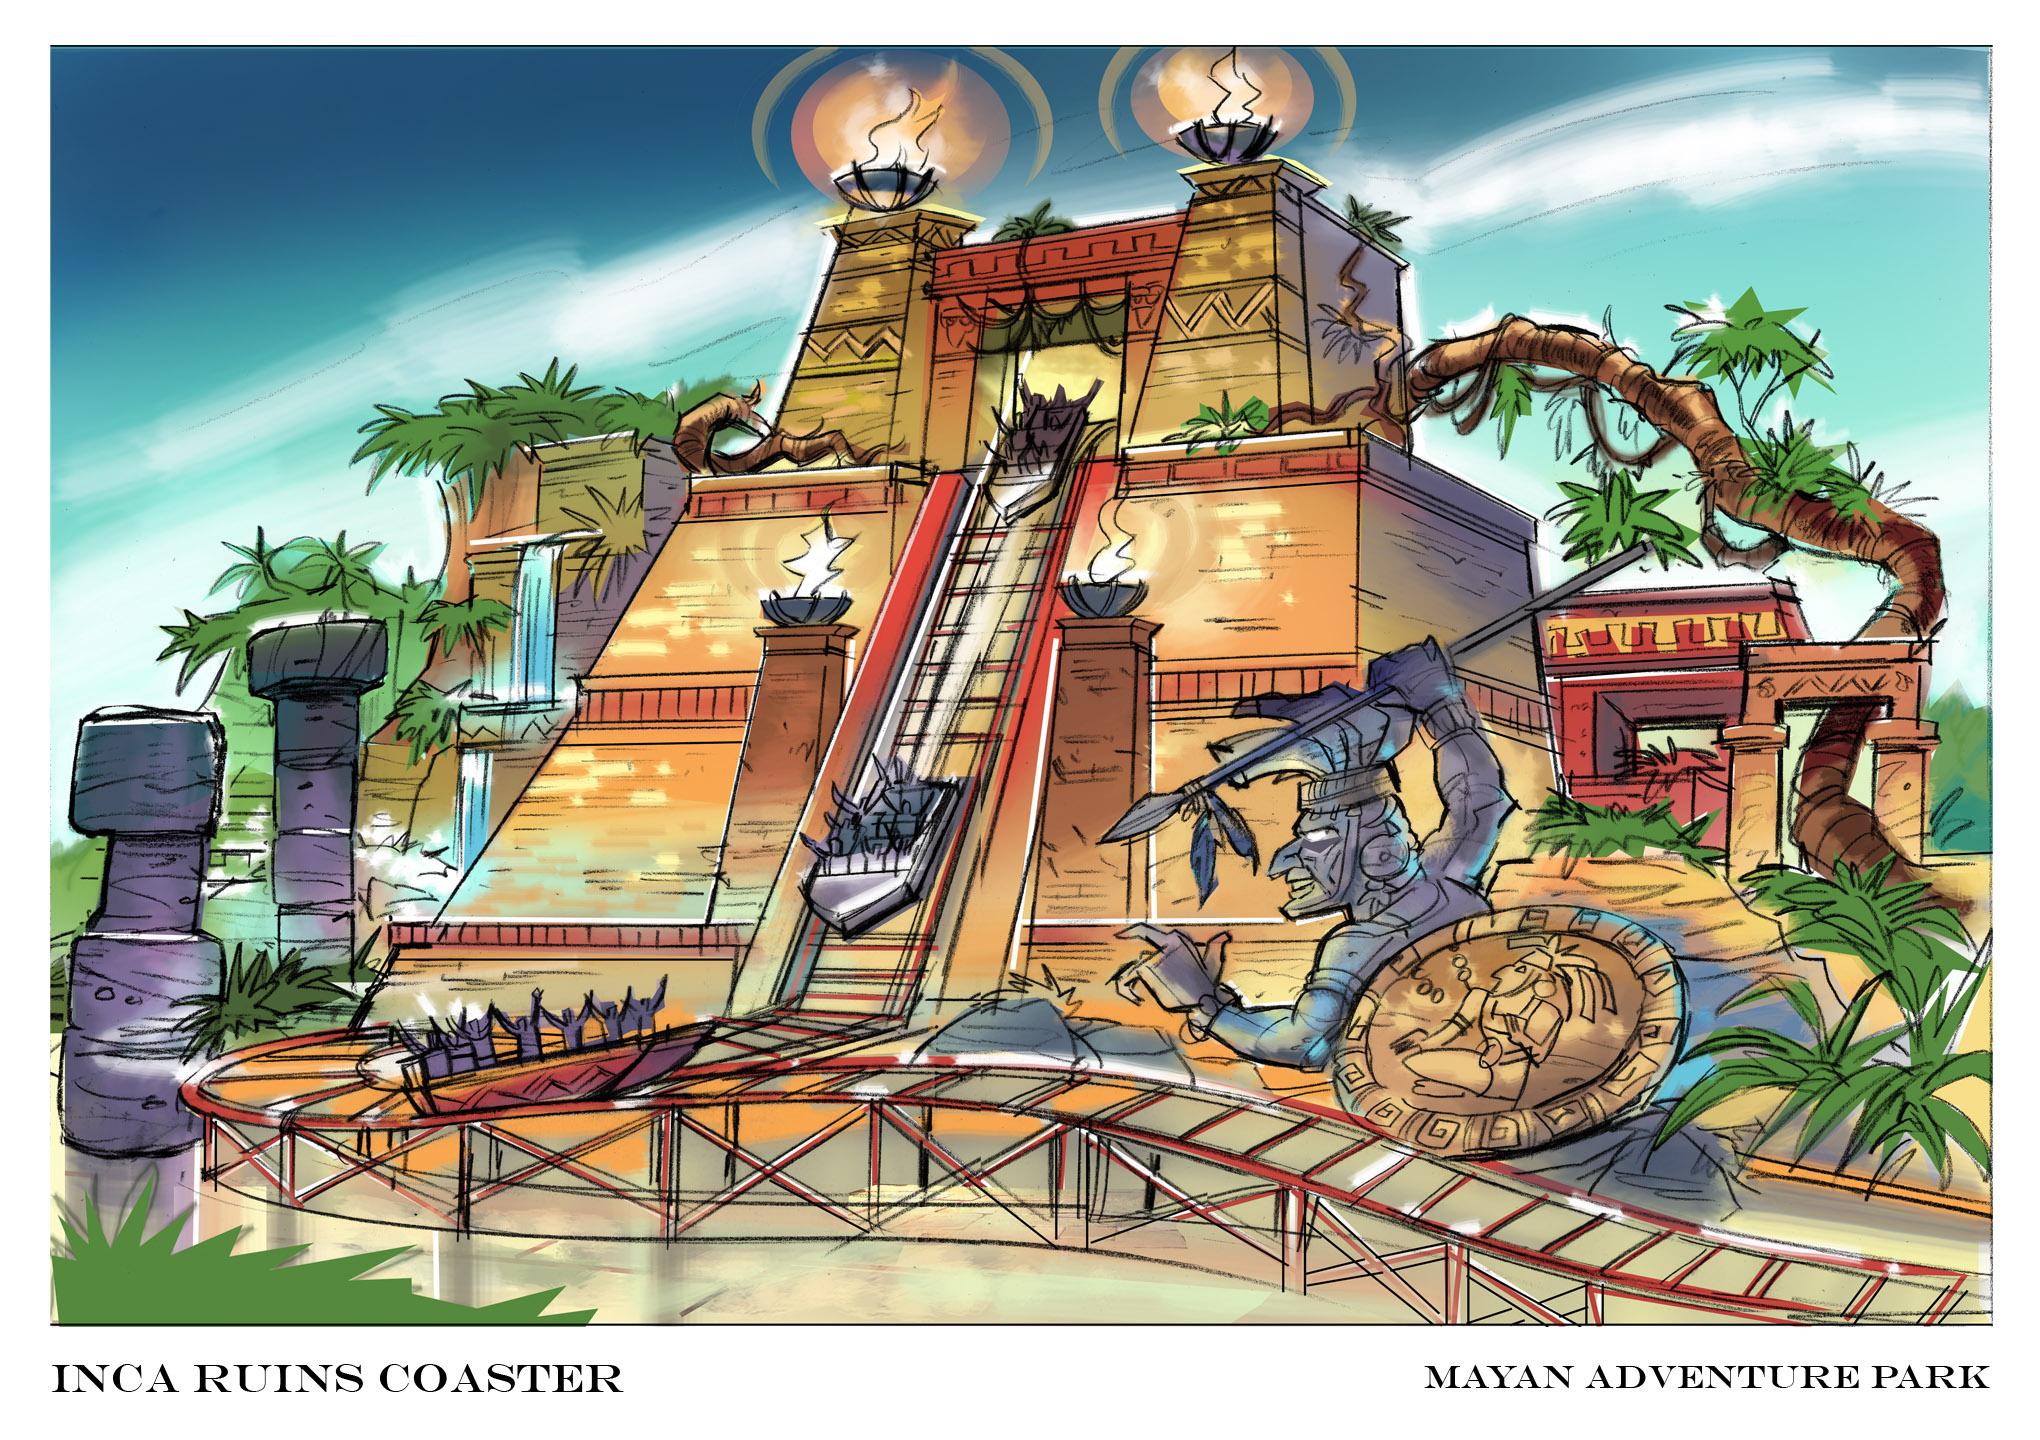 MAP-Inca Ruins Coaster.jpg